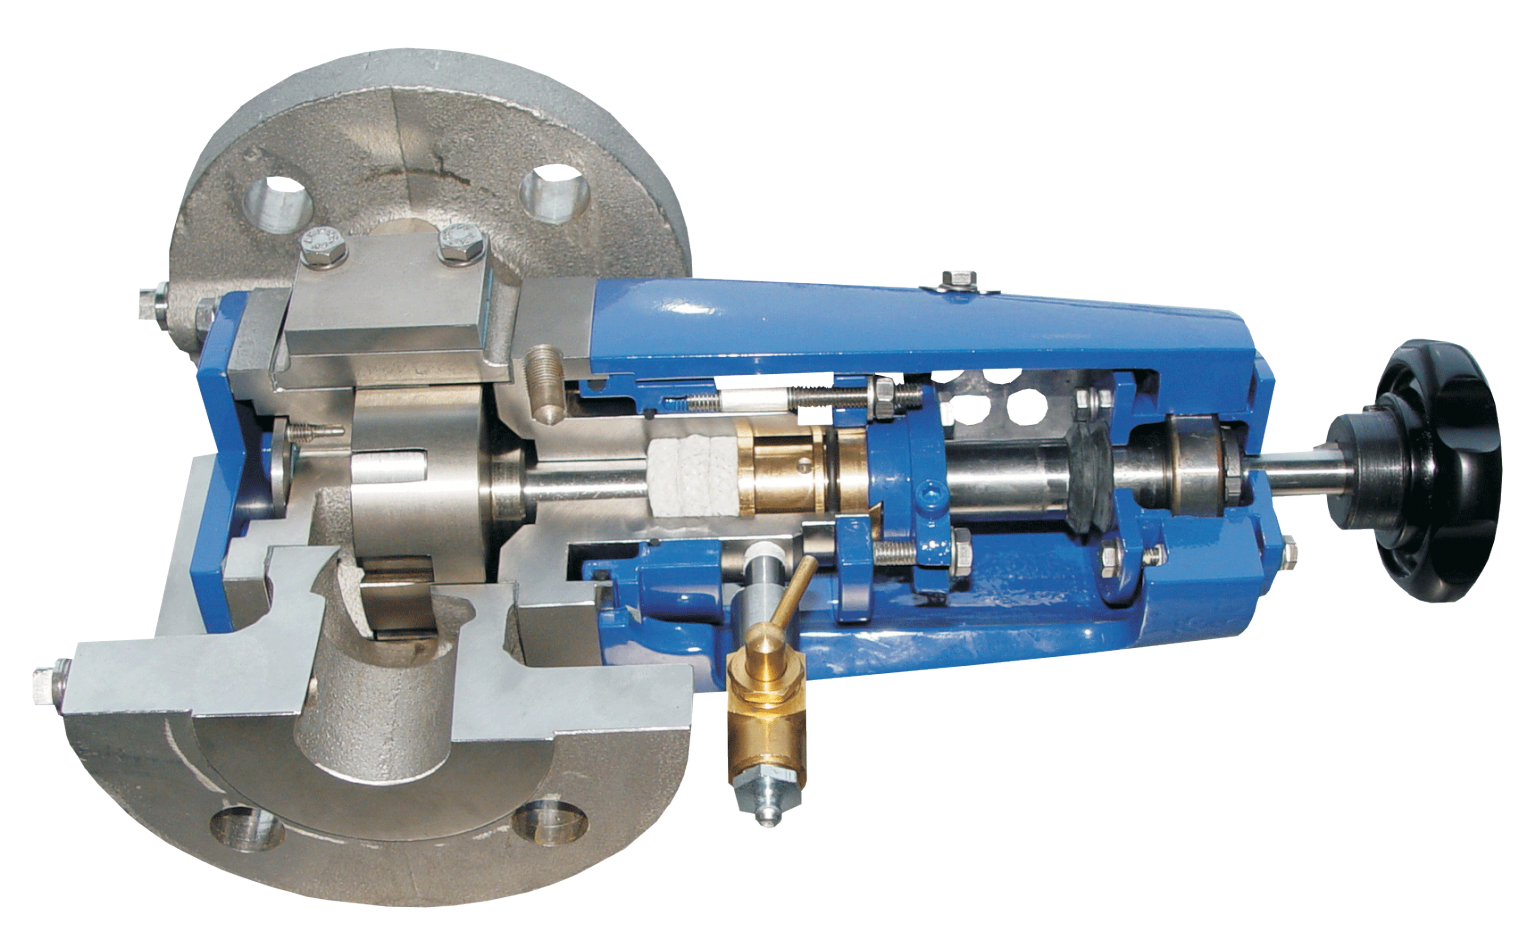 The chocolate producer relies on a Desmi close-coupled internal gear pump